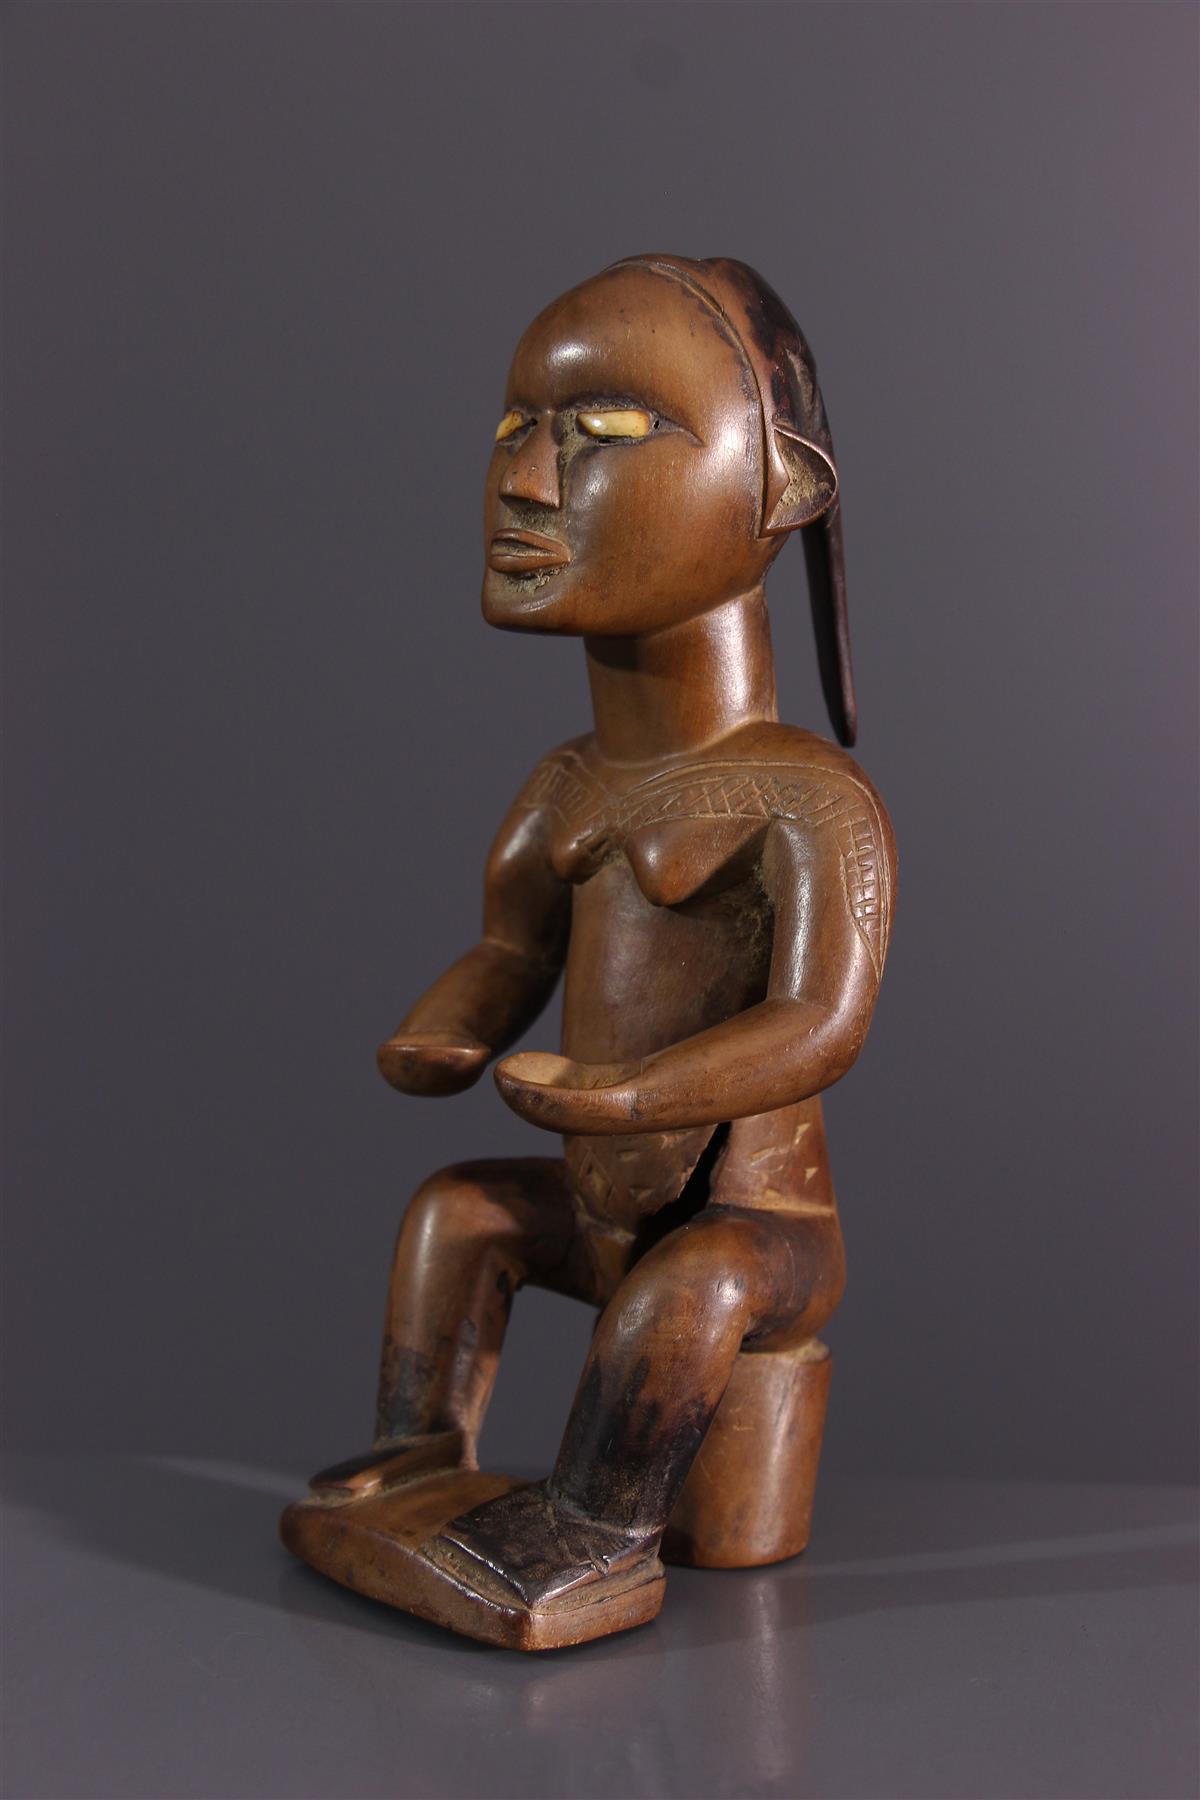 Statuette Bembé - Art africain